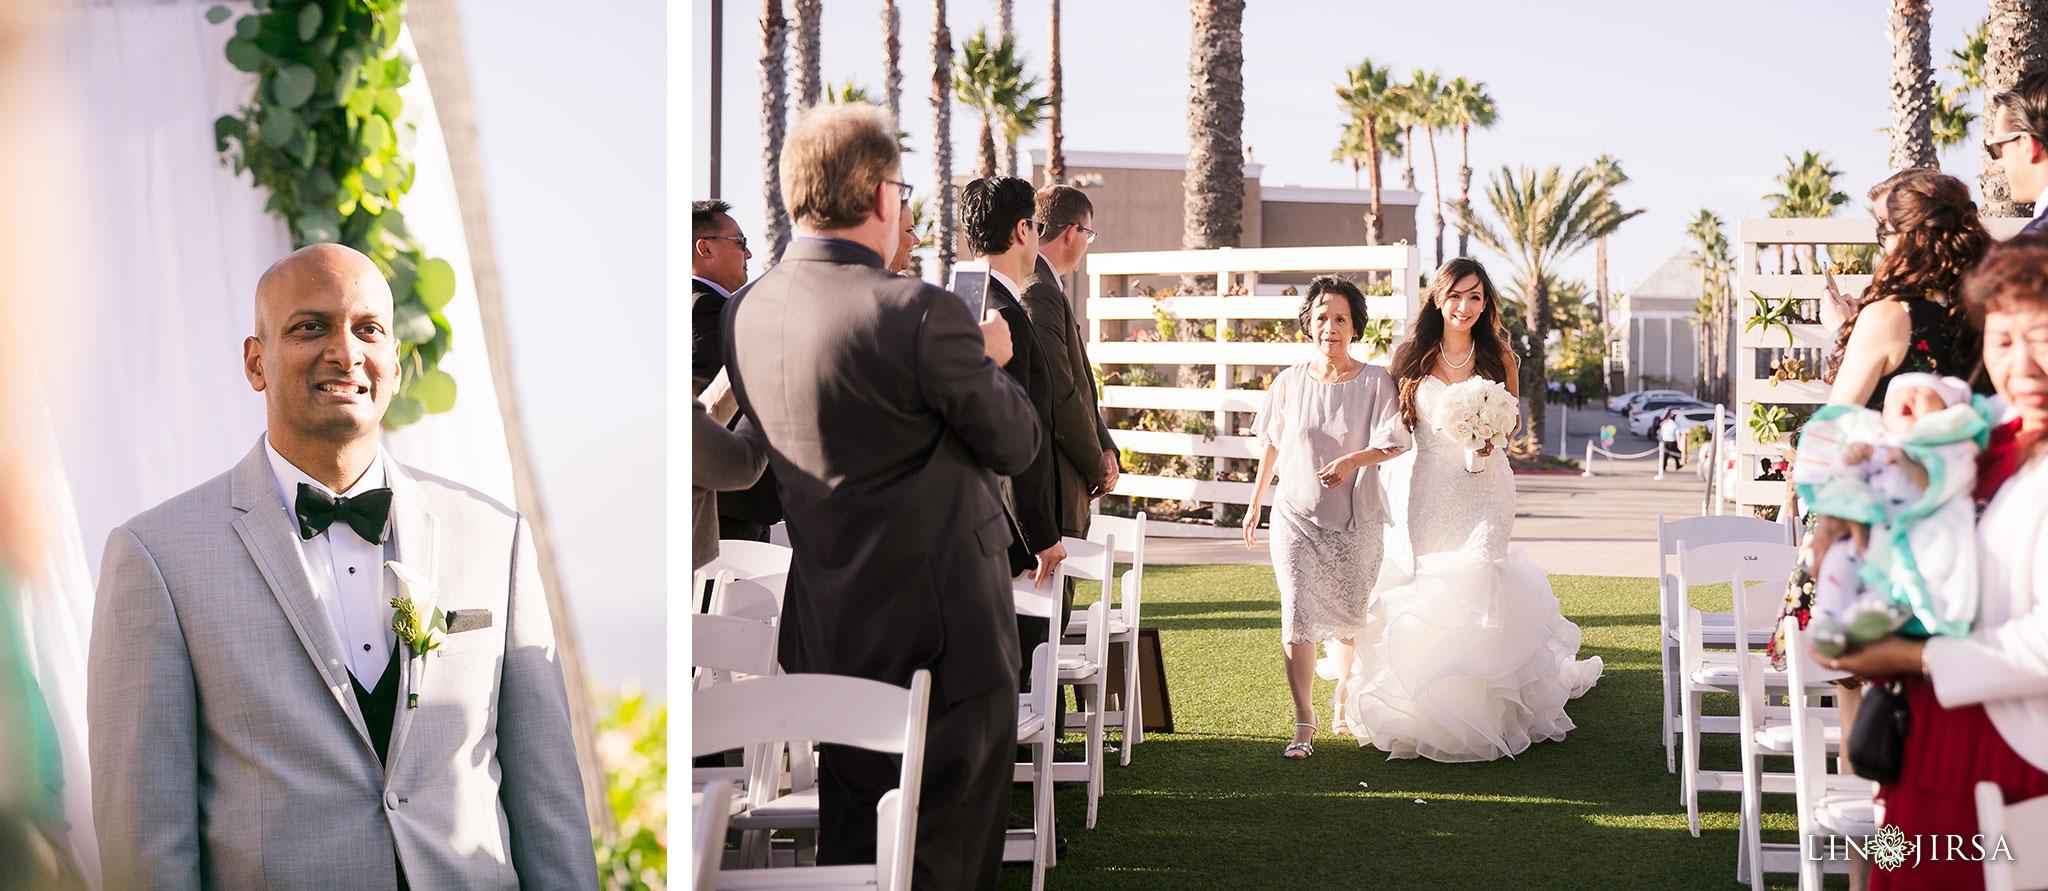 17 Portofino Hotel Redondo Beach Wedding Photography